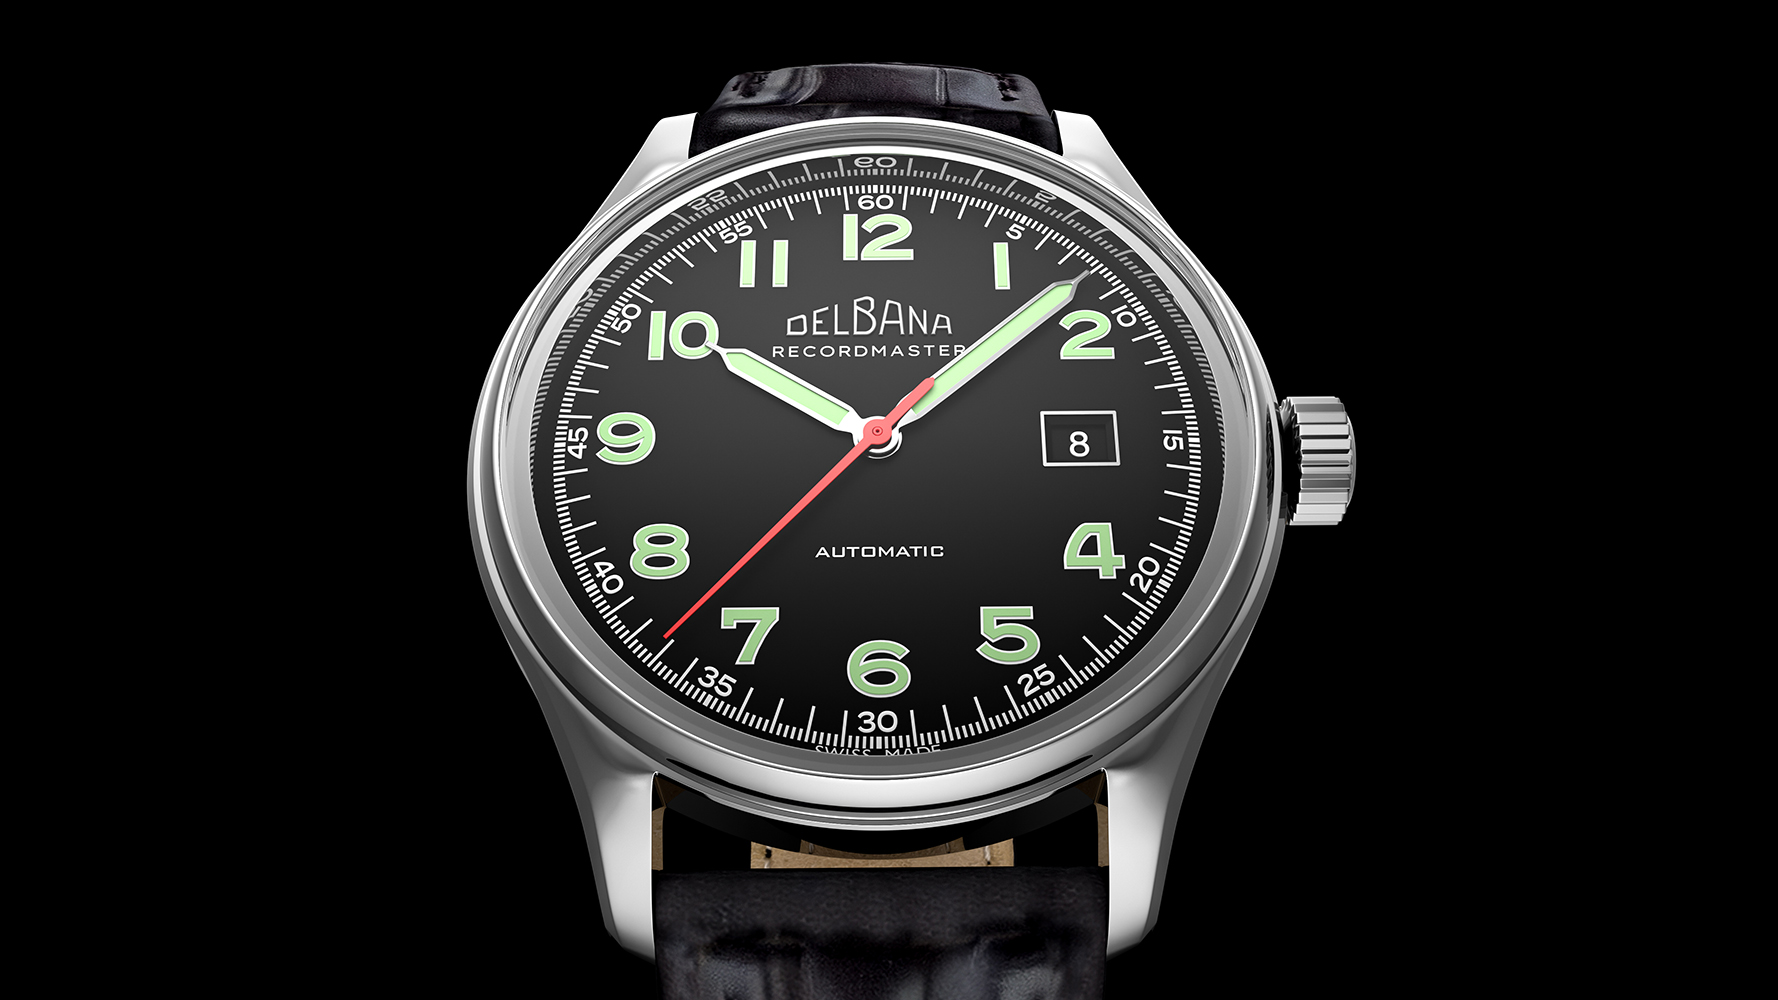 Zegarek męski Delbana recordmaster 41602.722.6.032 - duże 4